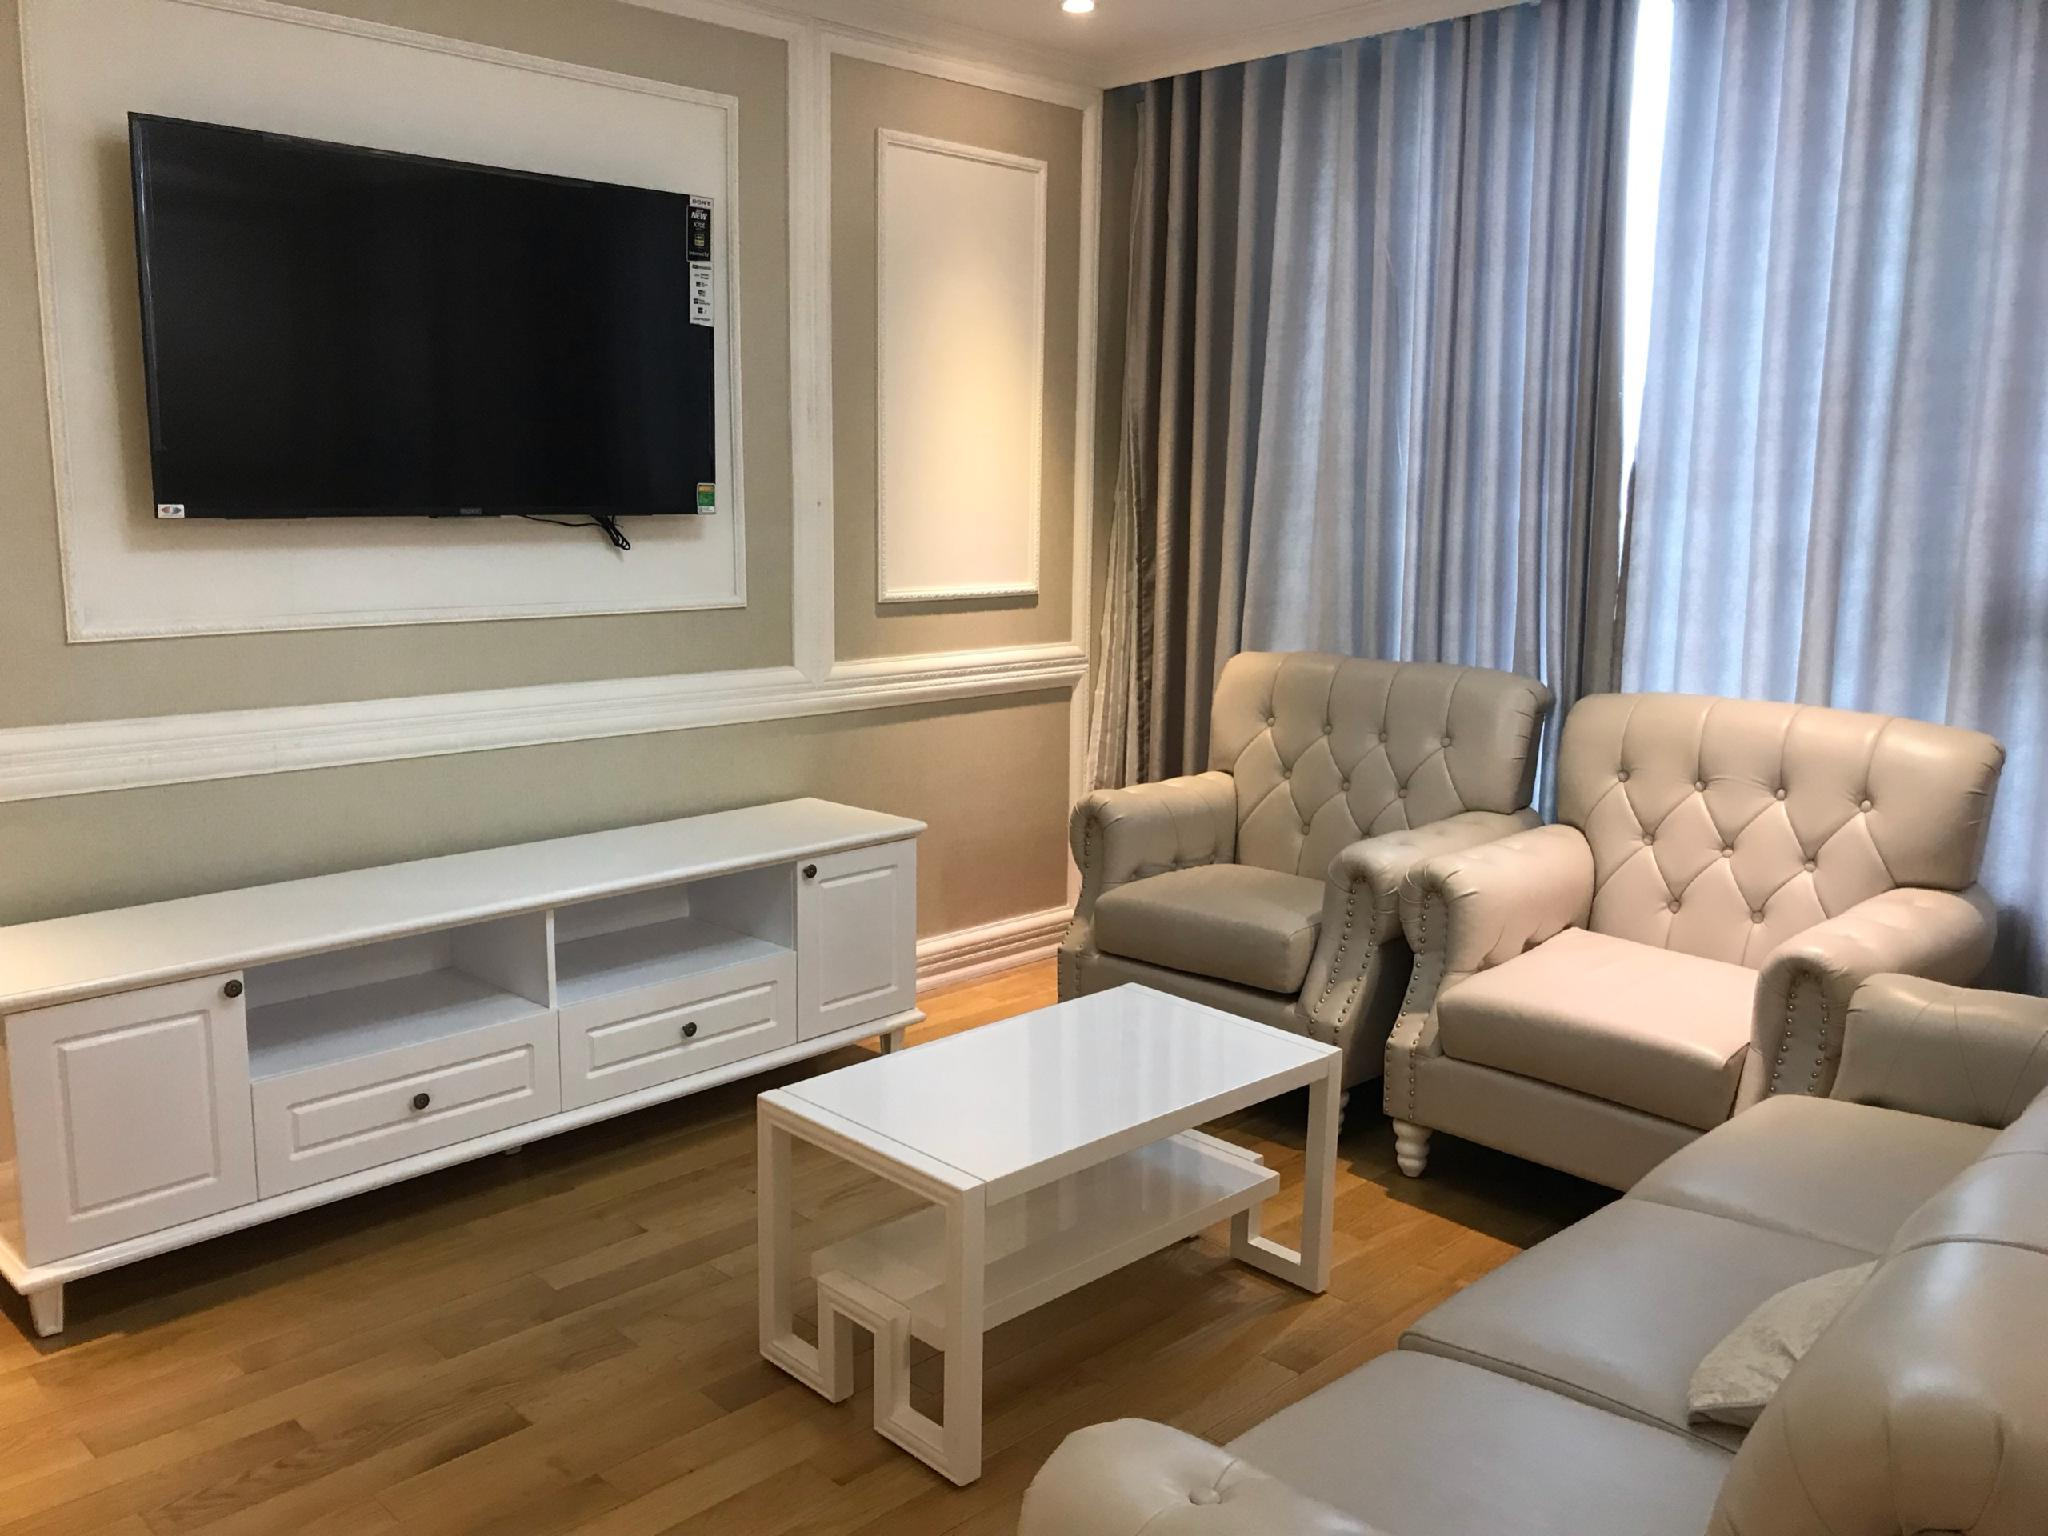 Leman Luxury Apartment 3 Bedrooms For Rent